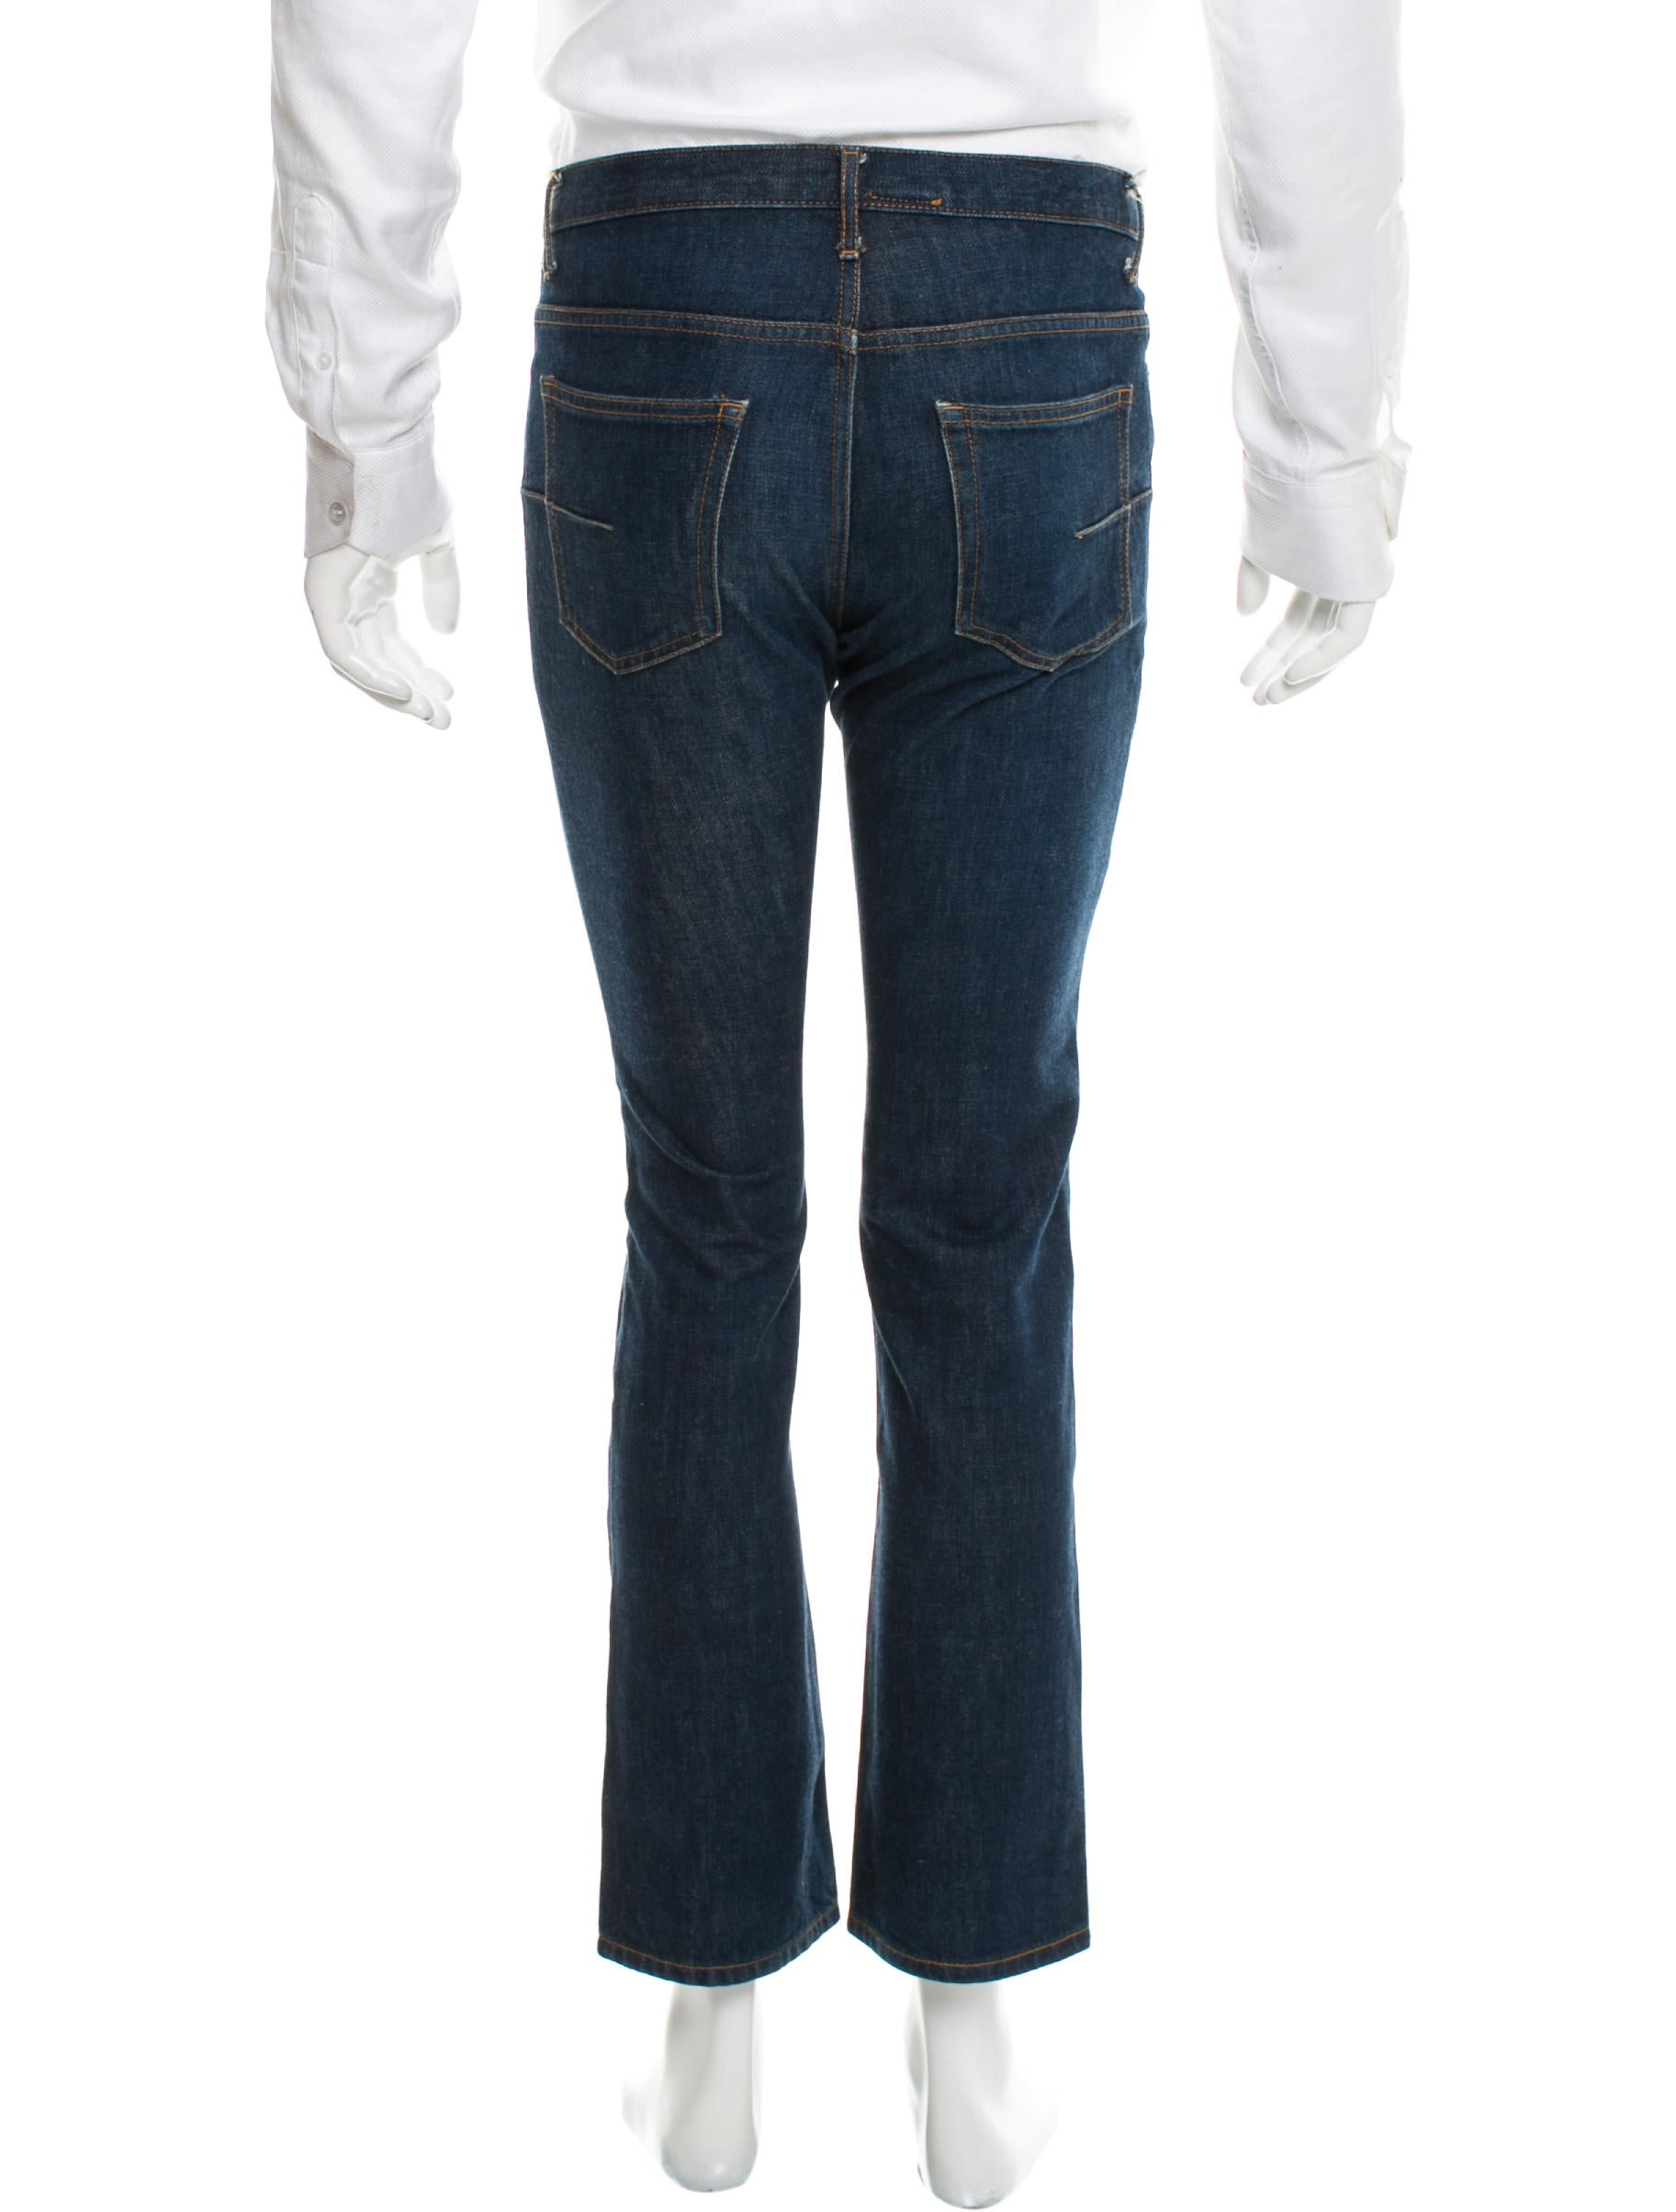 dior homme skinny jeans clothing hmm23293 the realreal. Black Bedroom Furniture Sets. Home Design Ideas